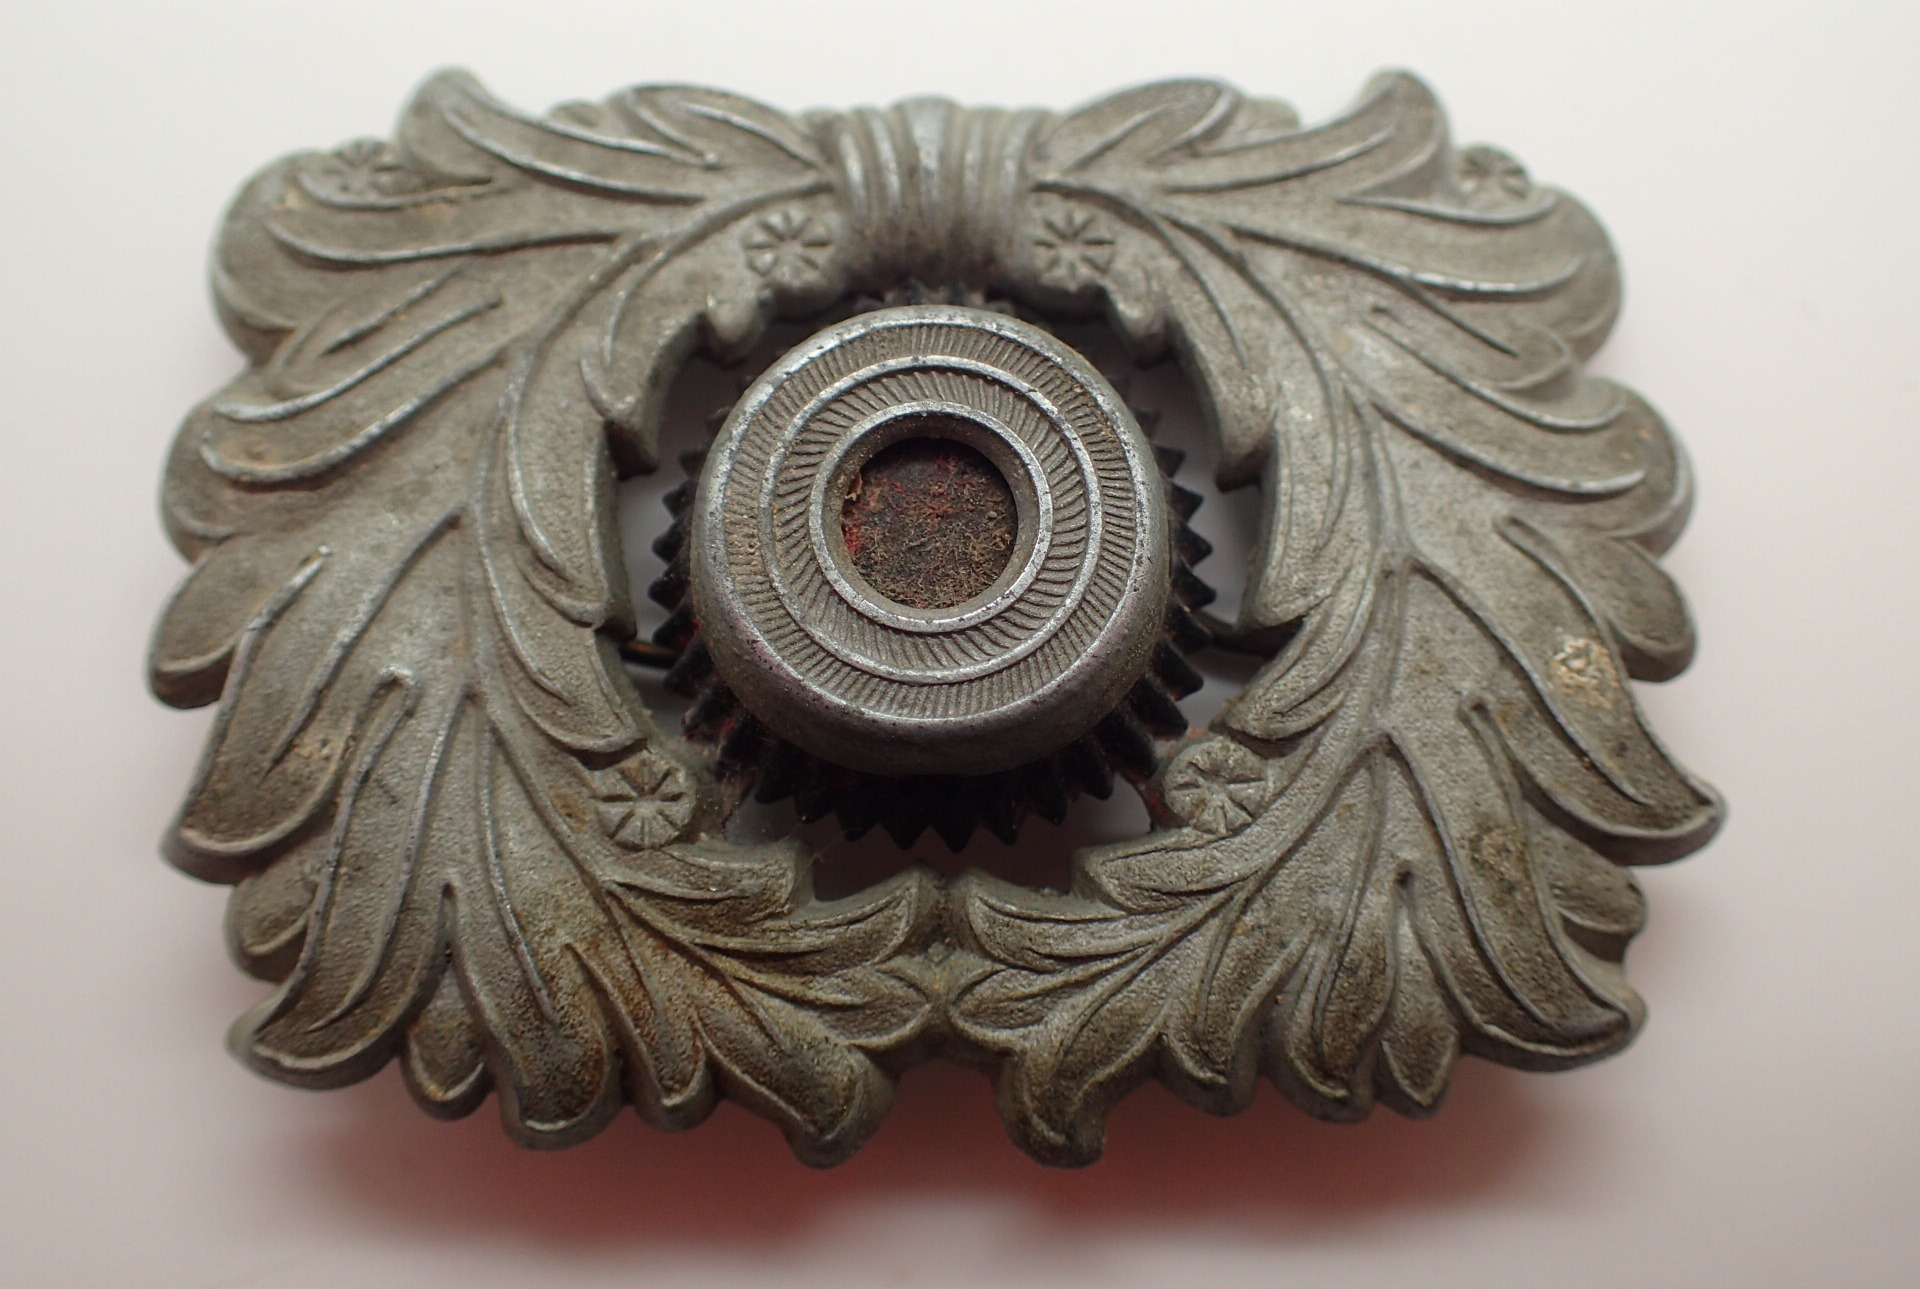 Lot 405 - WWII German Customs Officers cap badge